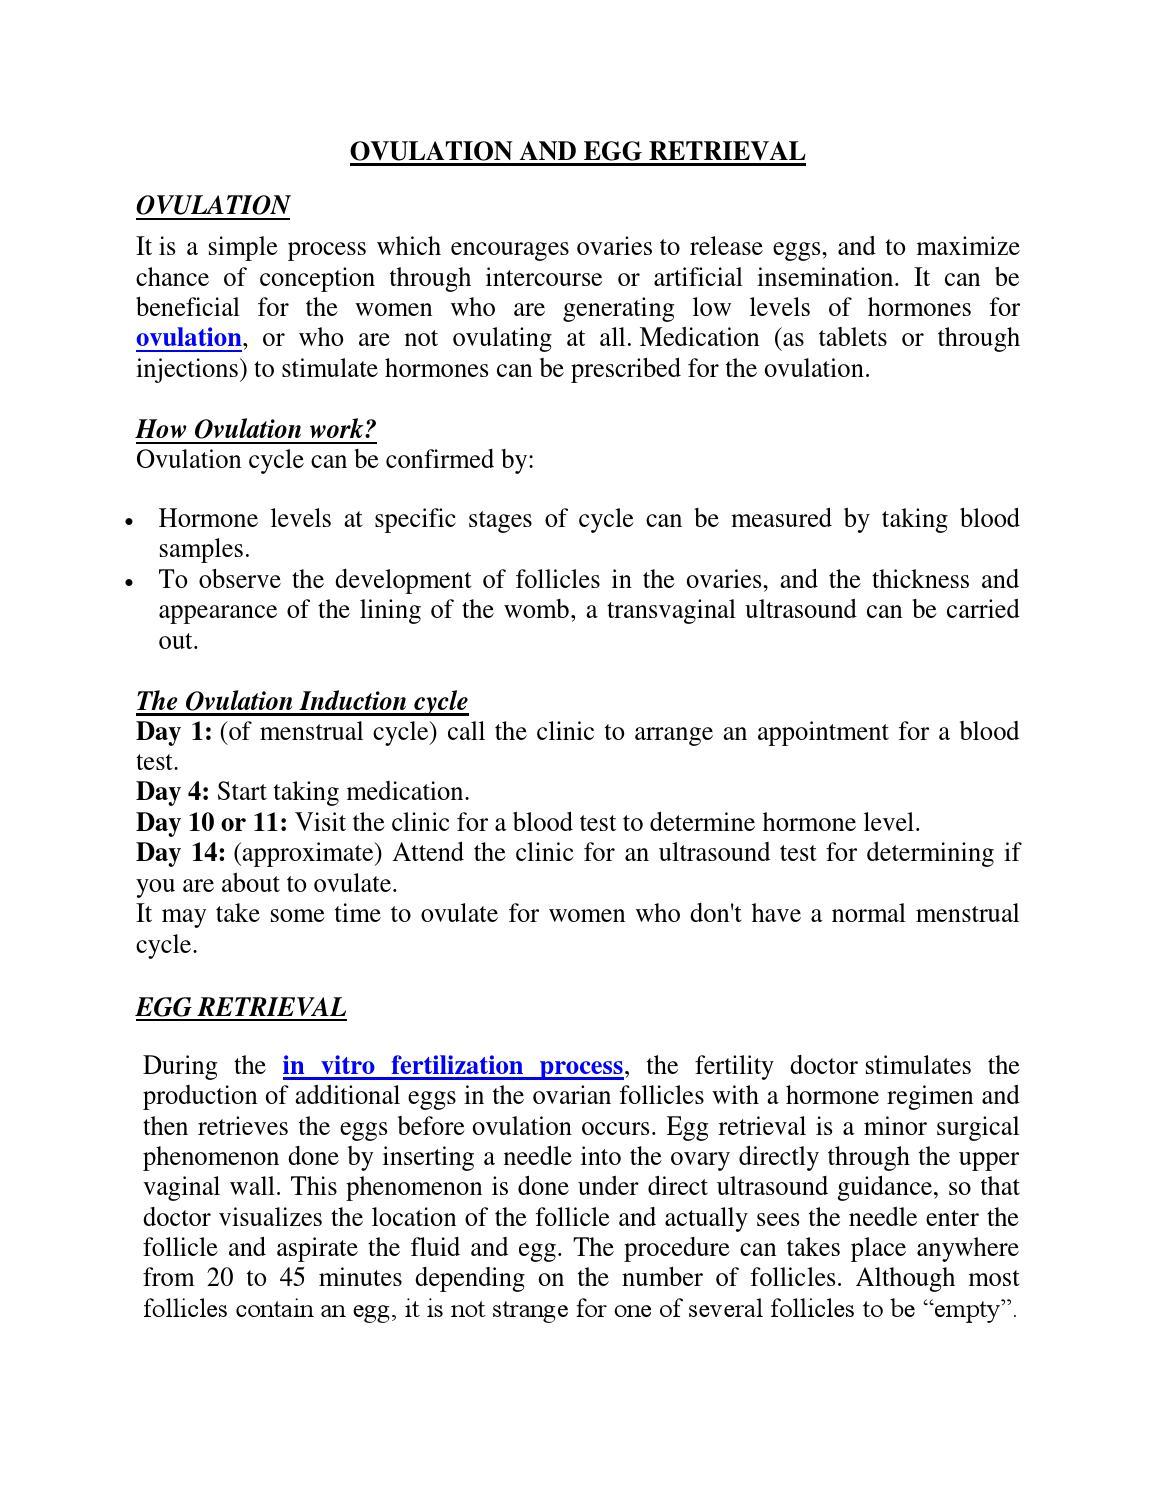 Ovulation and egg retrieval by Kunaalsingh - issuu